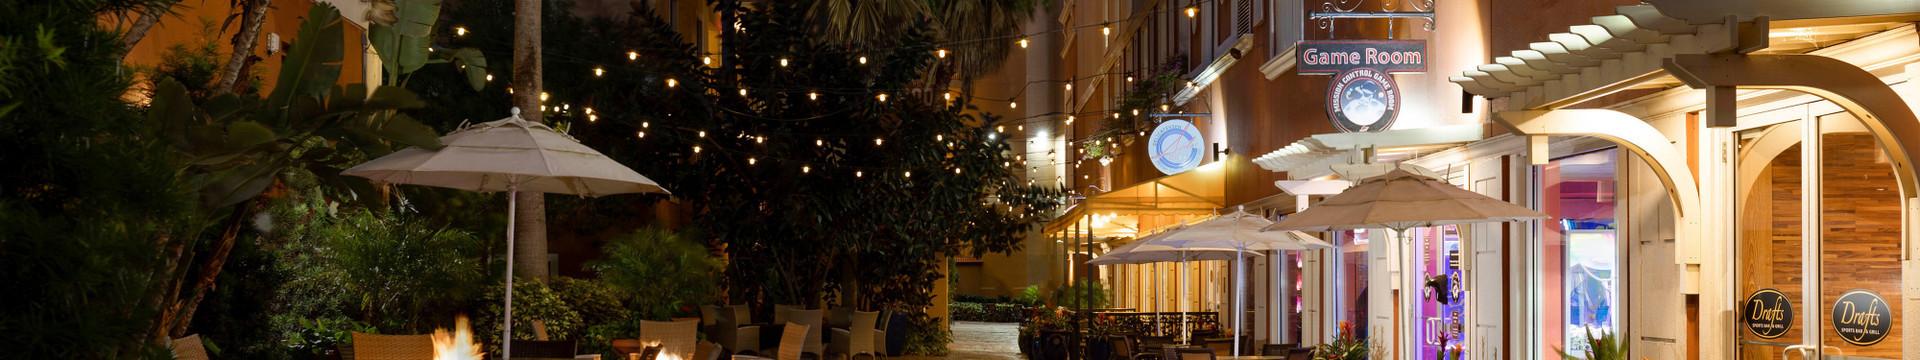 Exterior of our hotel in Orlando, FL | Orlando Florida Hotels | Resort Credit at Westgate Lakes Resort & Spa